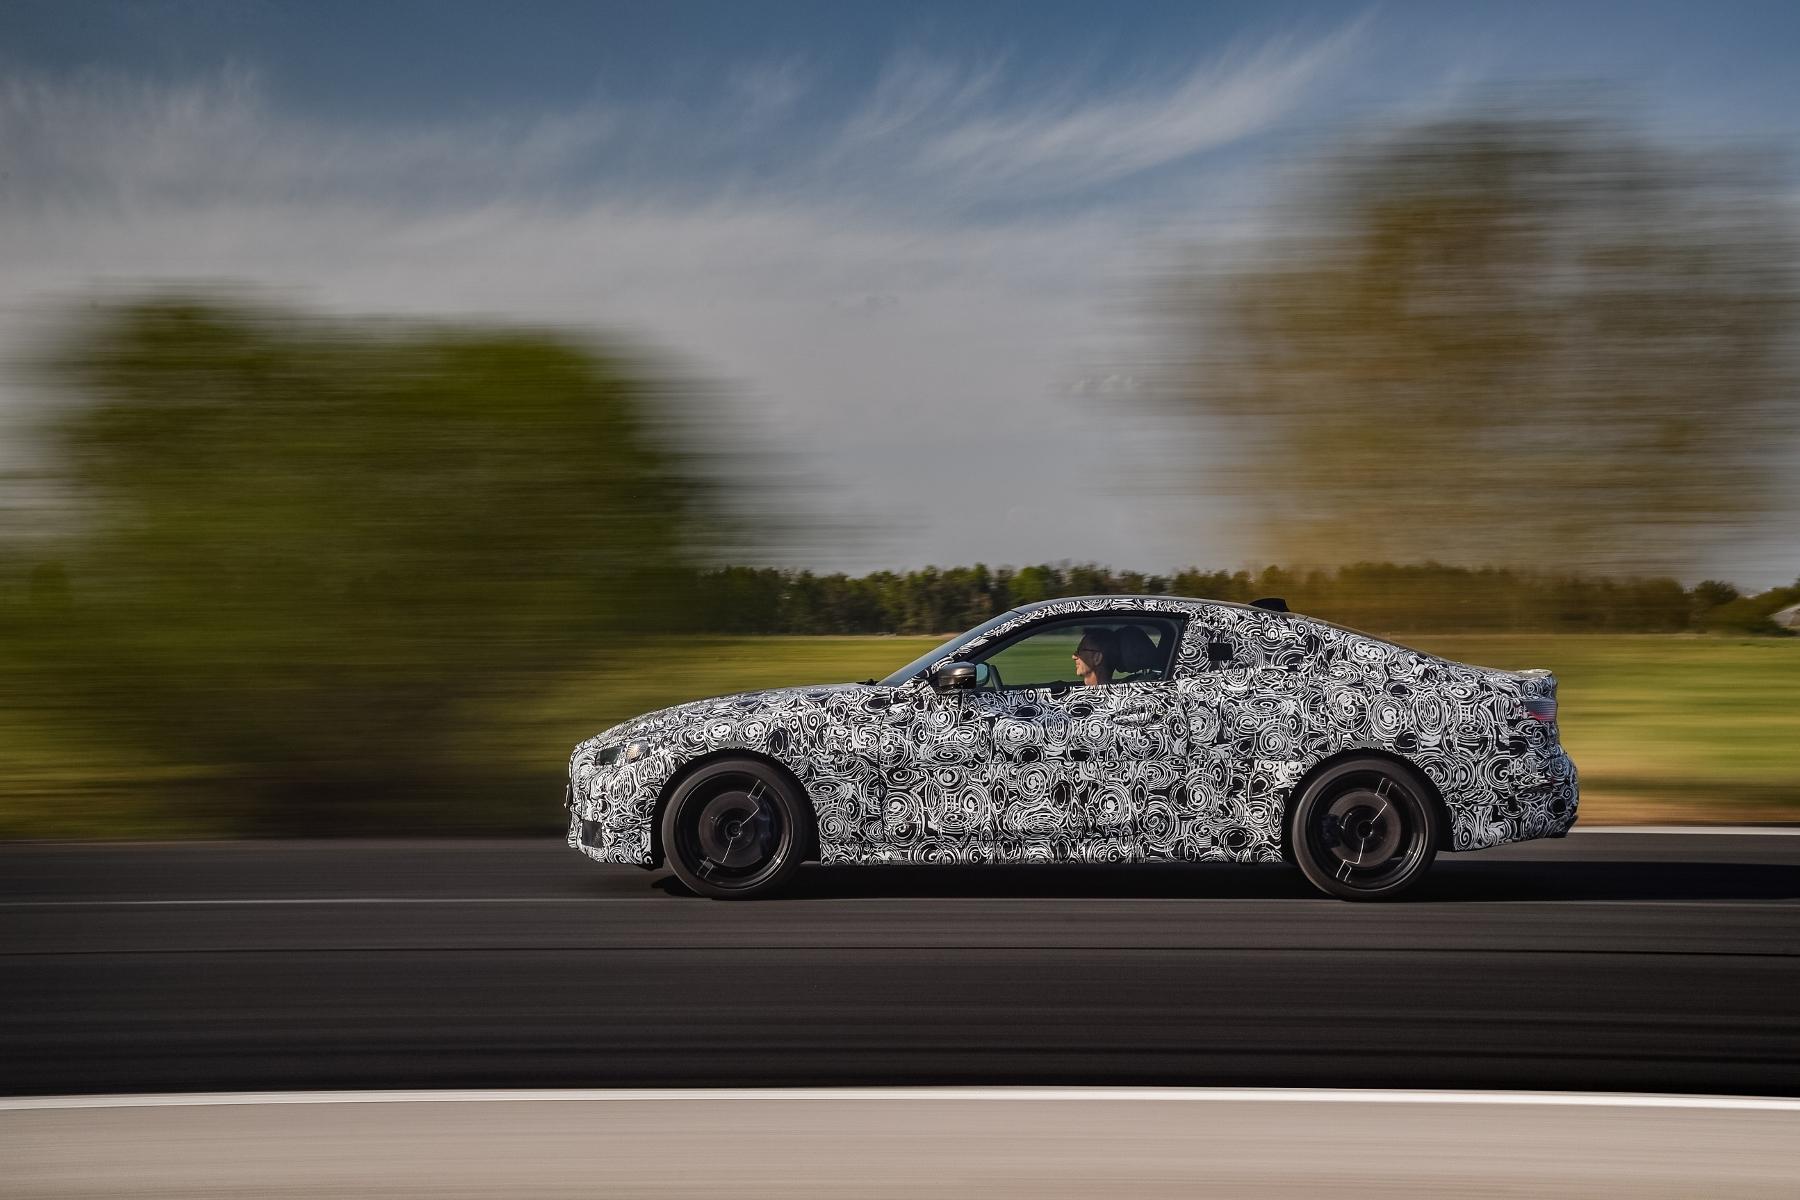 Nové BMW radu 4 Coupé dostane športovejší podvozok ed01Q6LKbJ bmw-4-coupe-11